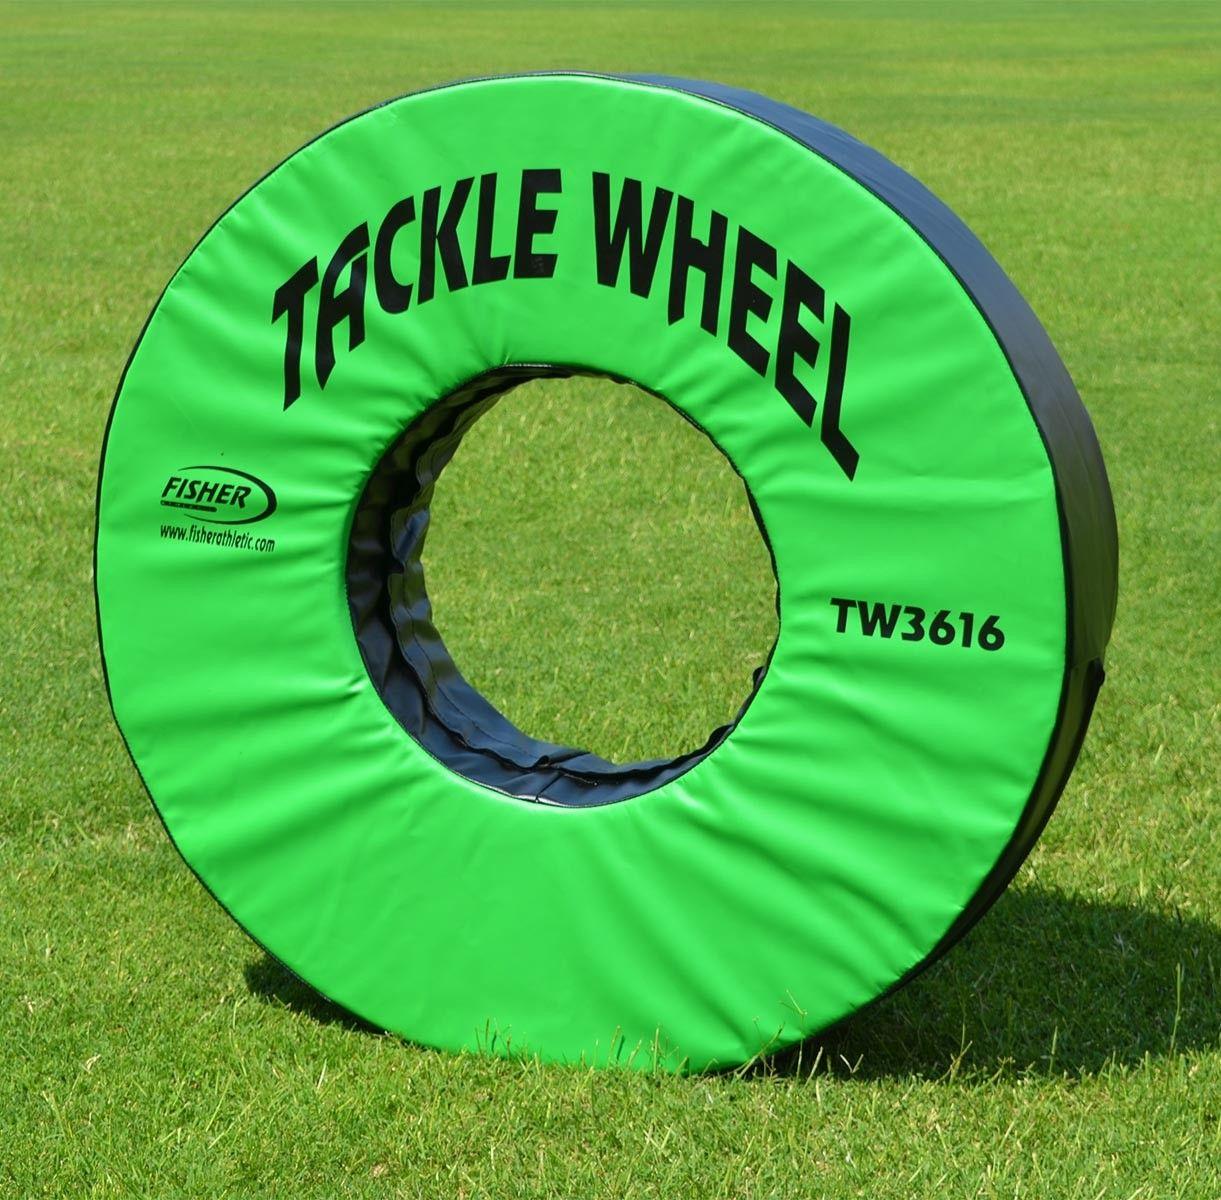 Fisher 36 dia football tackle wheel tw3616 tackling